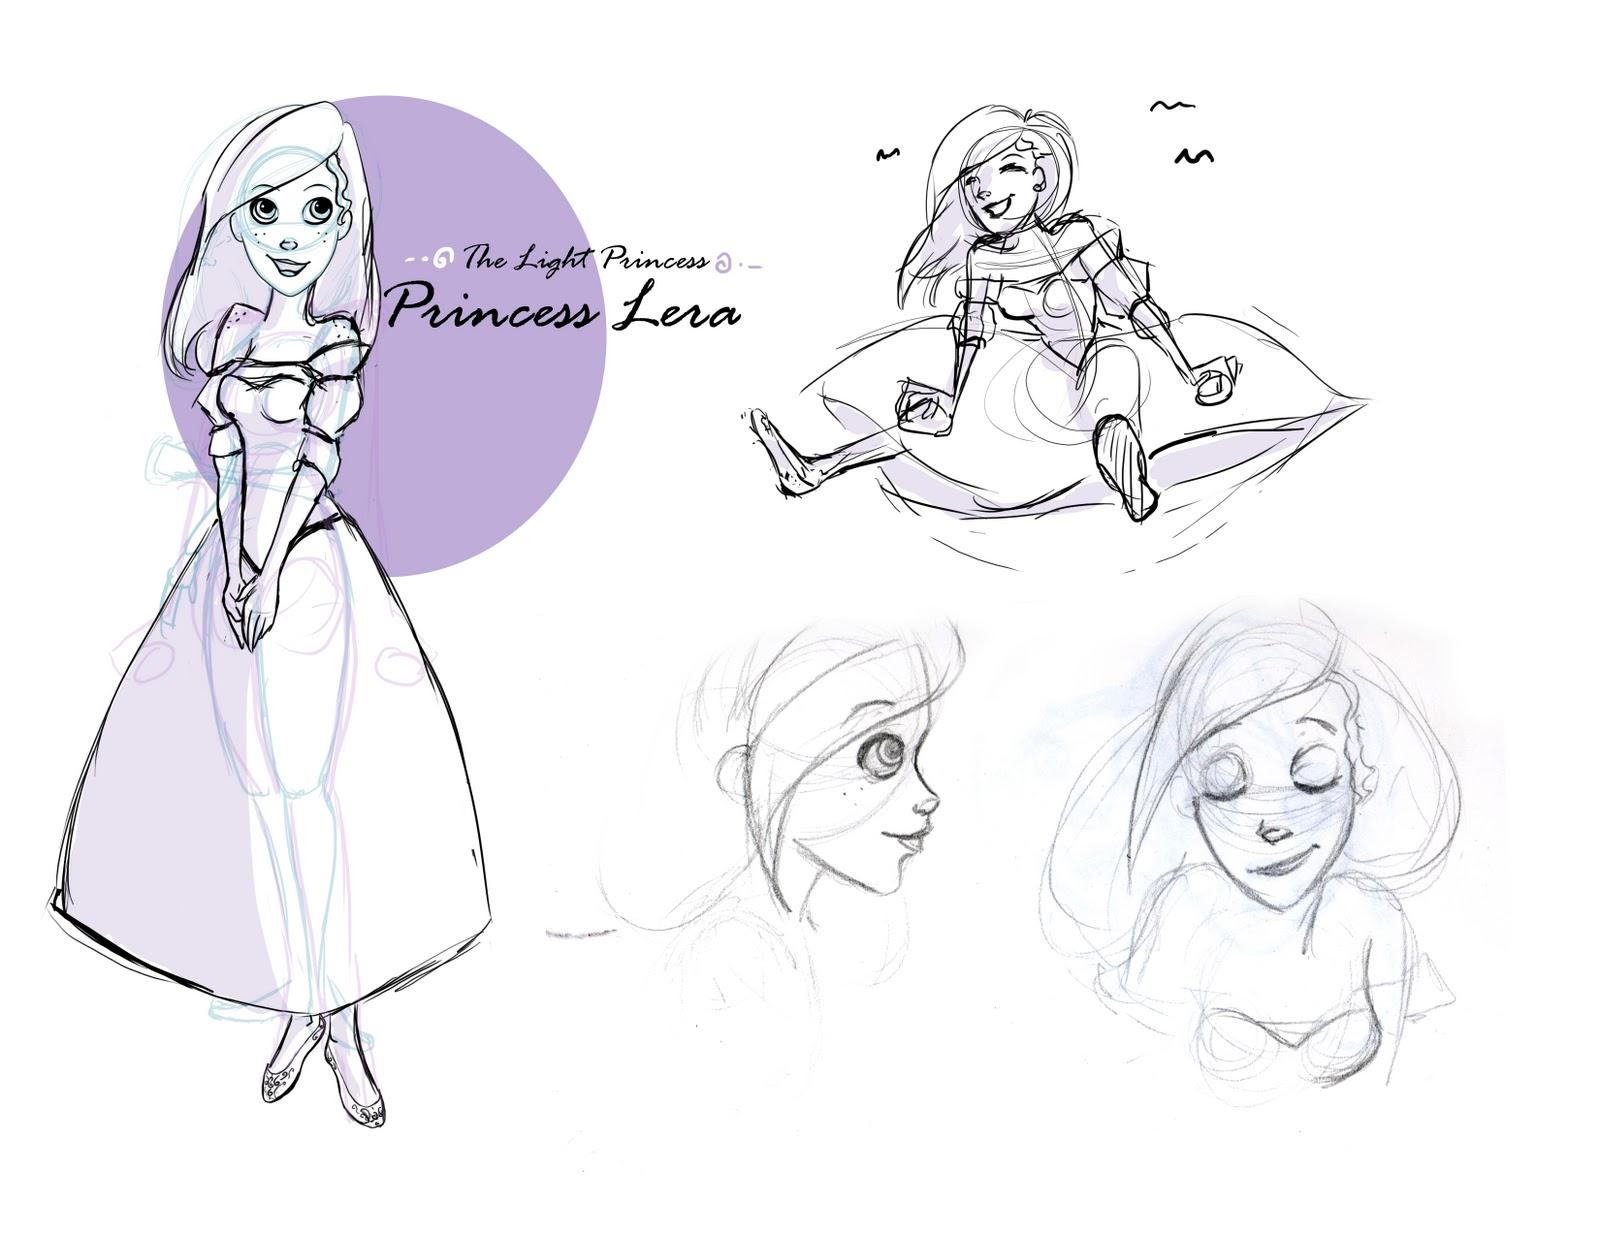 Character Design Poses : Character design class samantha s princess and joker